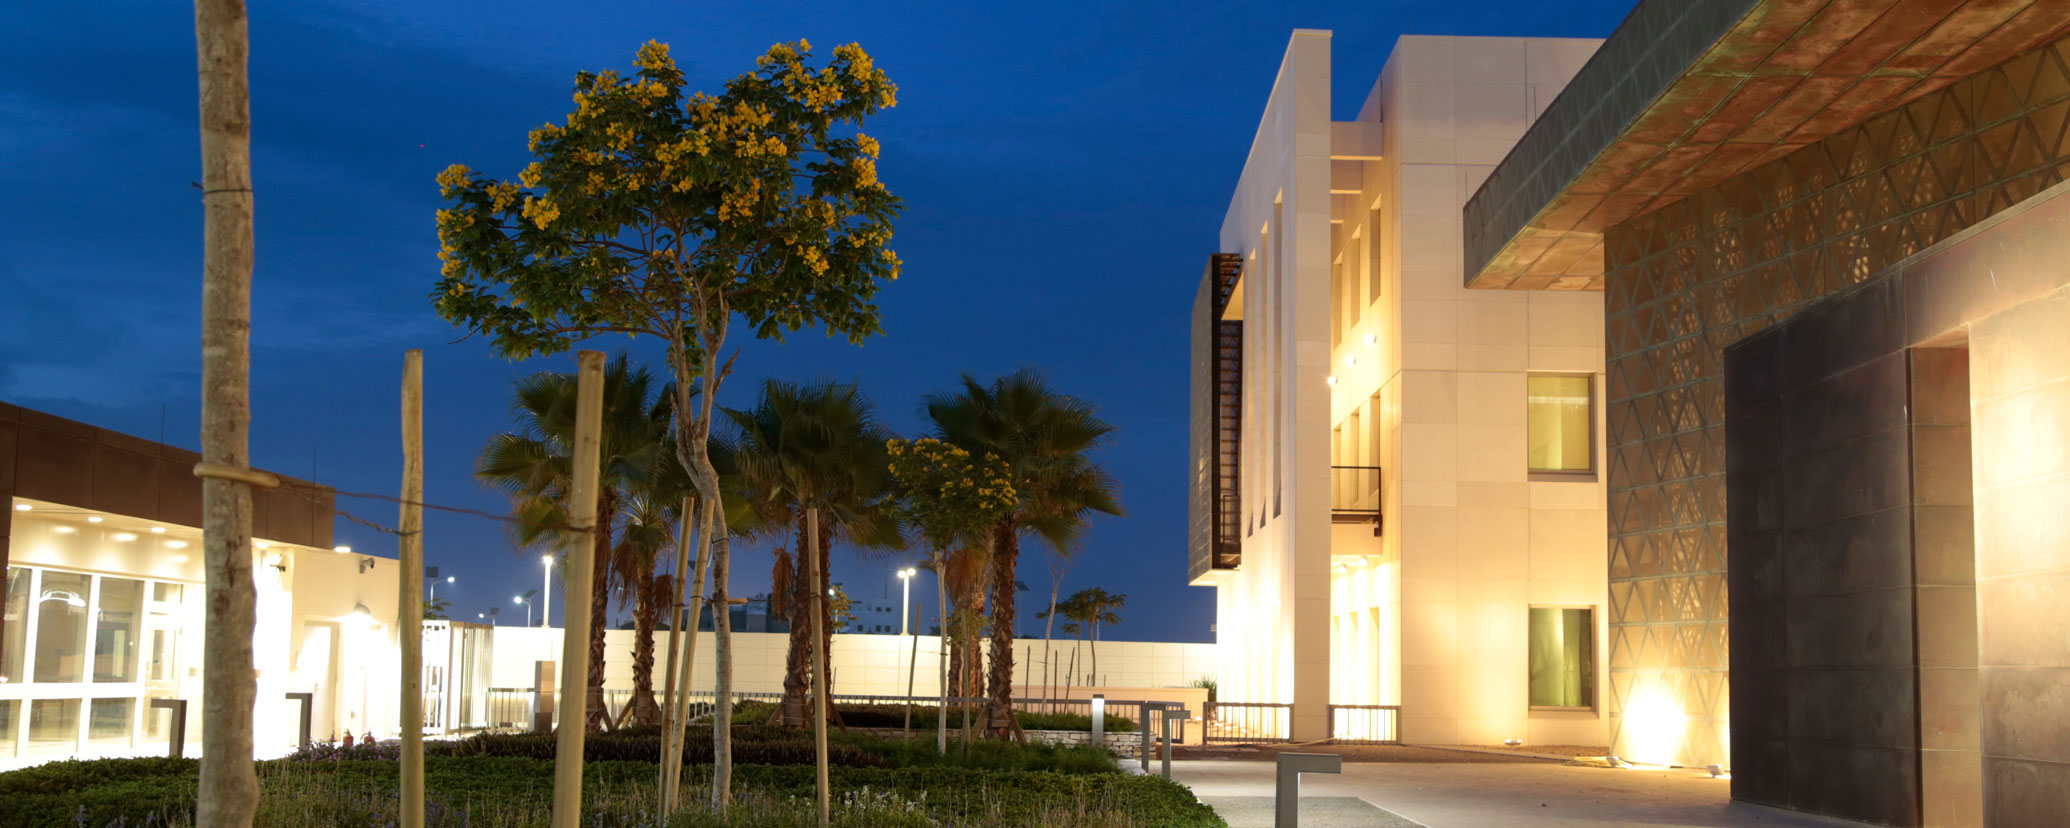 U.S. Embassy Nouakchott, Mauritania - Caddell Construction ...